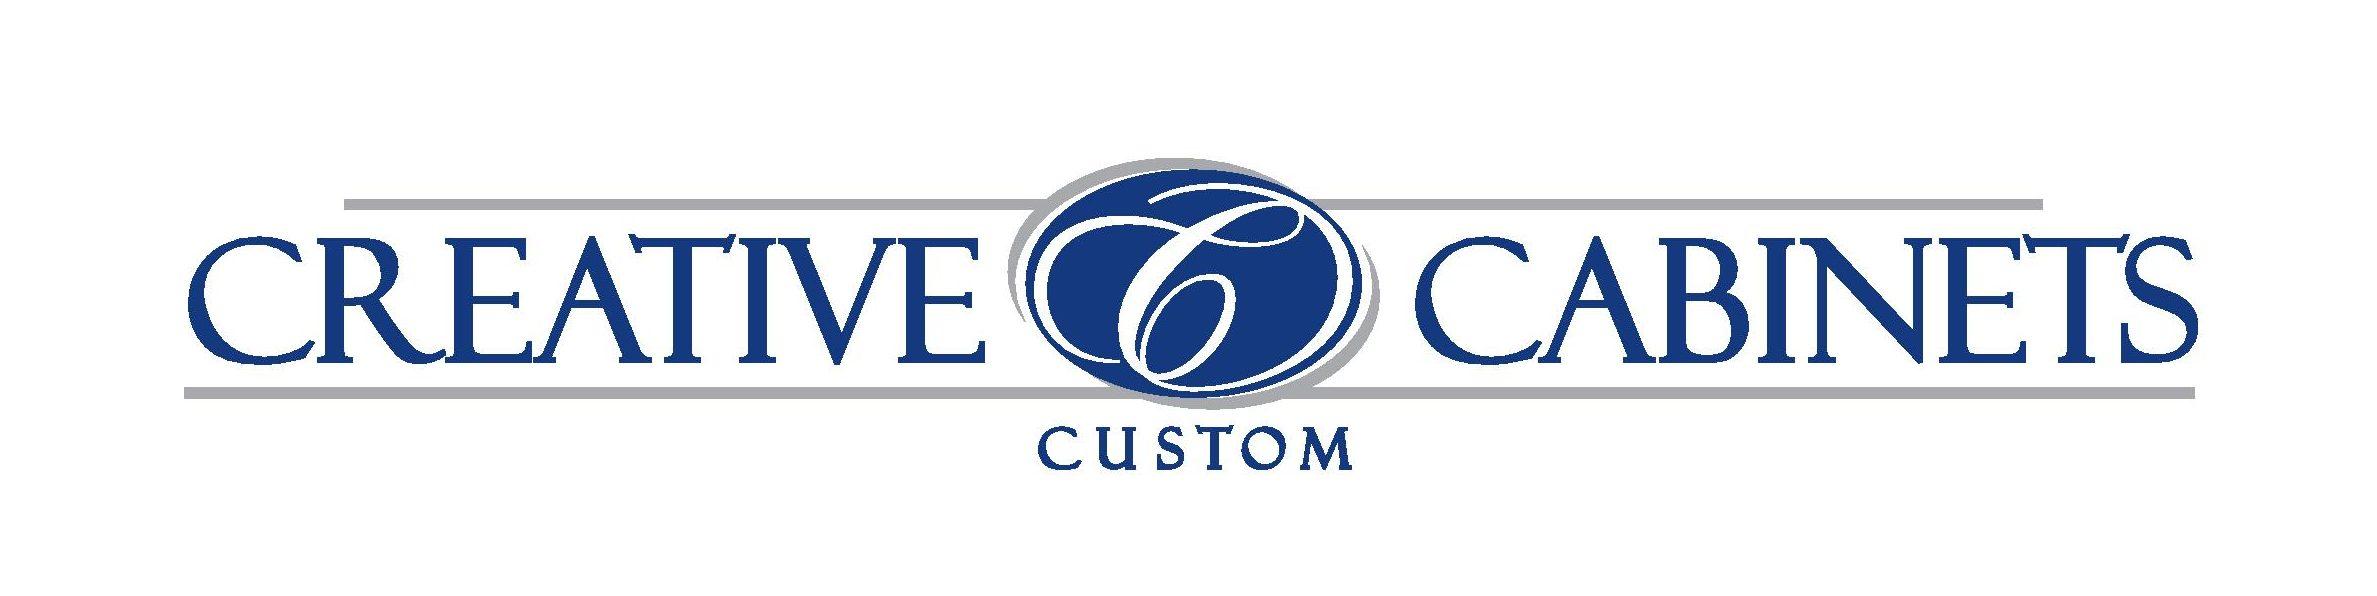 Creative Custom Cabinets